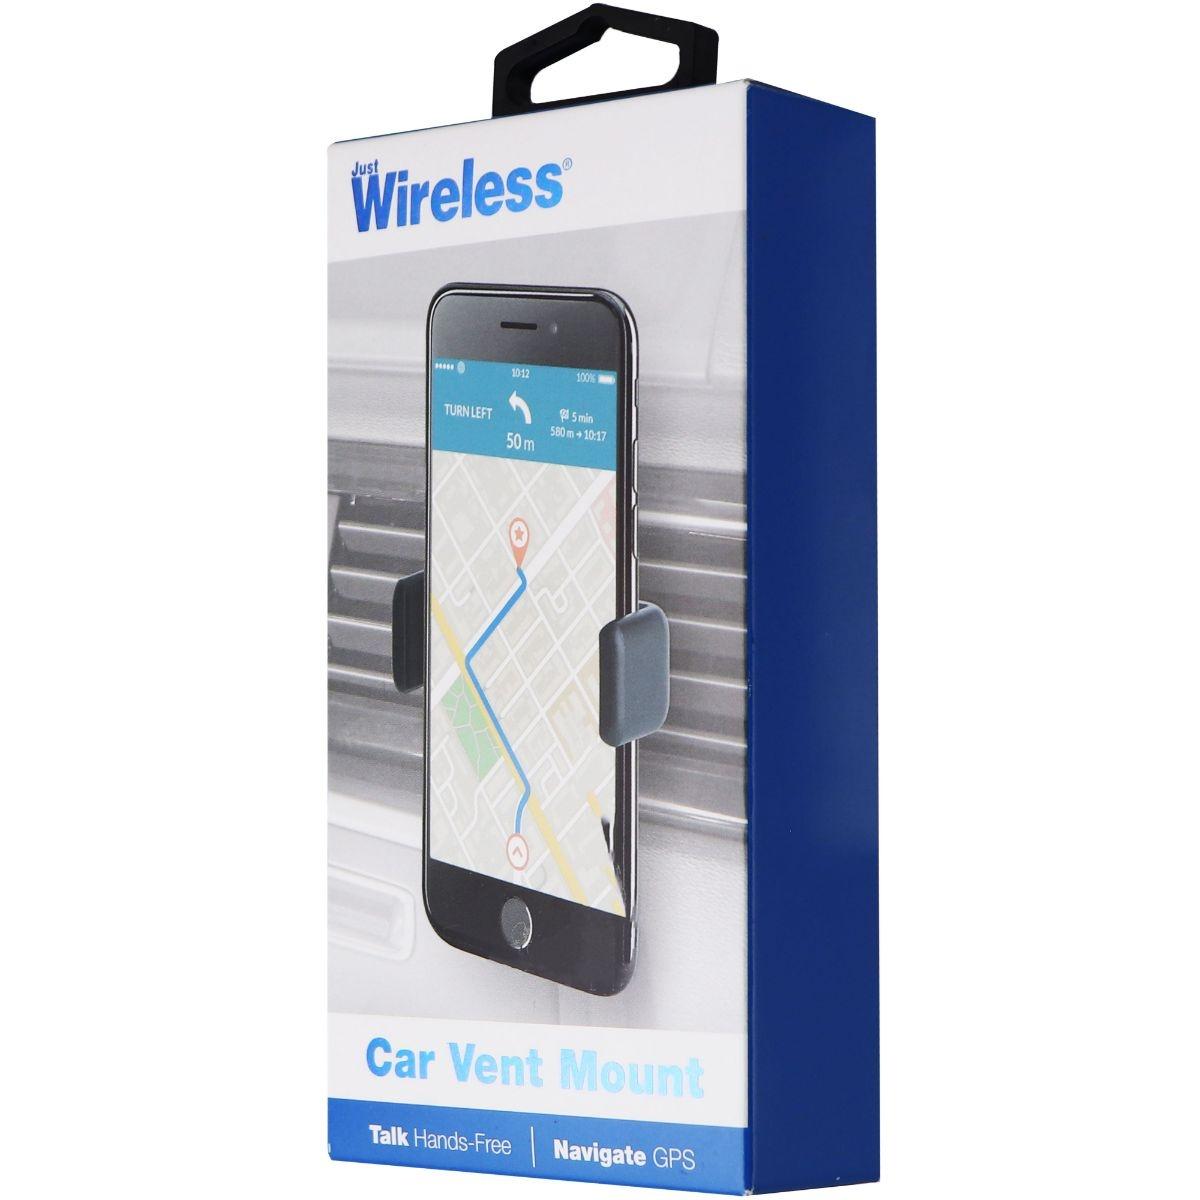 Just Wireless Universal Car Vent Mount for Smartphones - Black